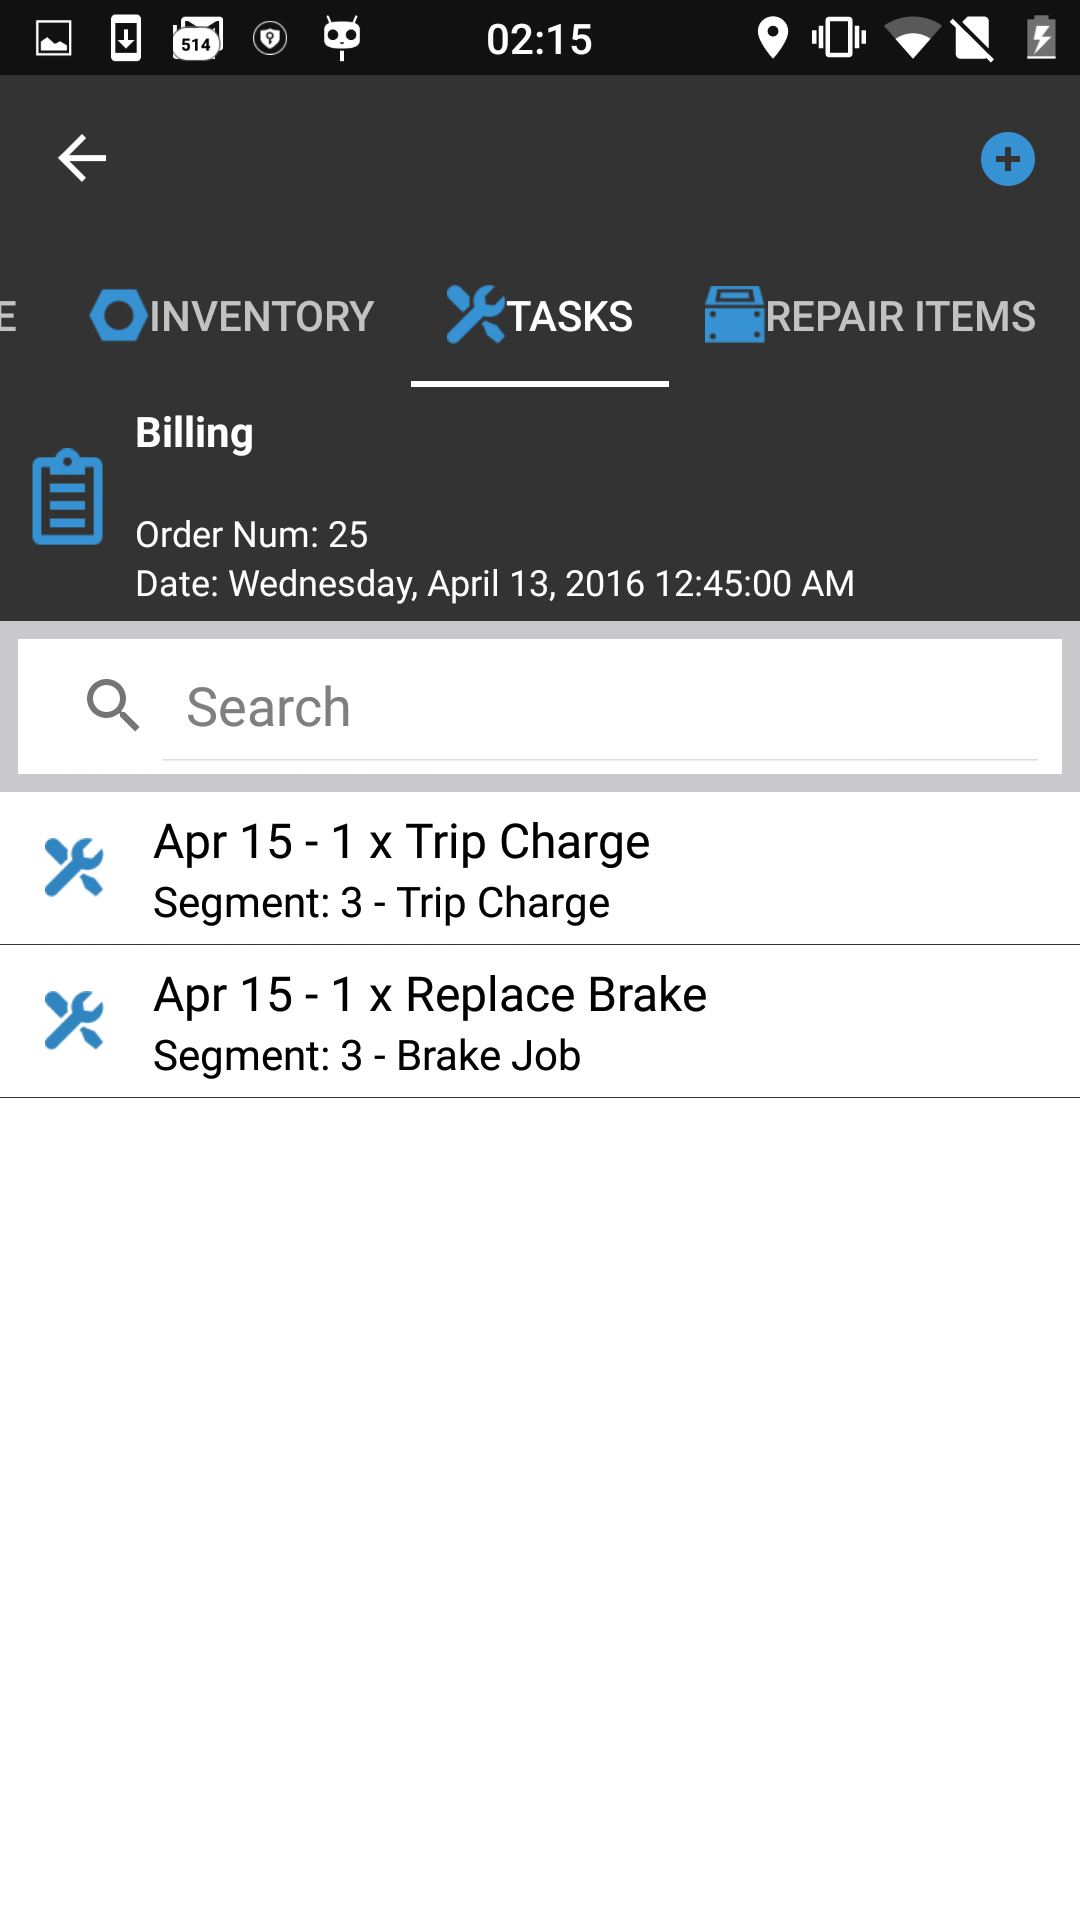 Work Job Details